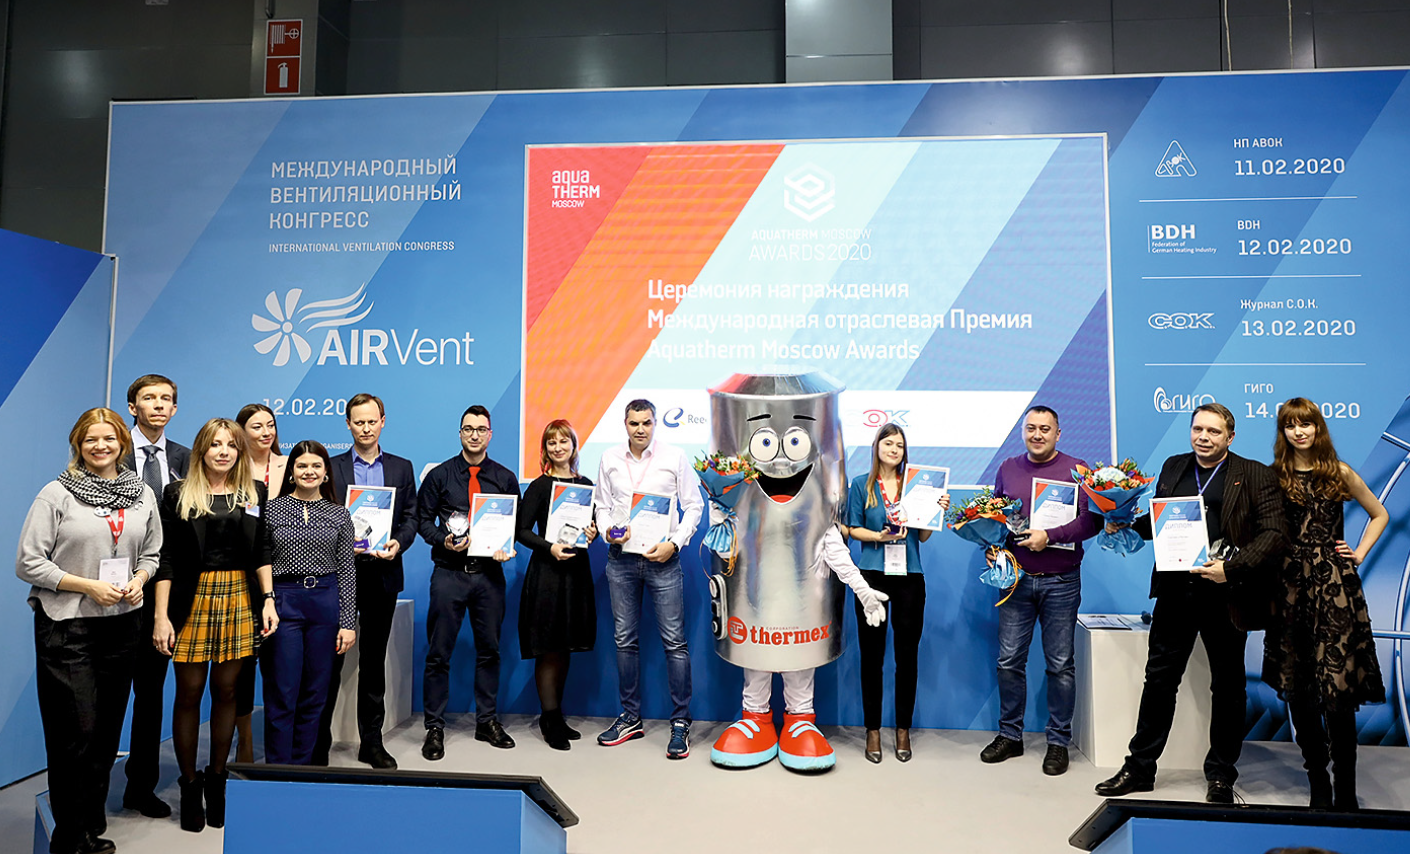 Победители Aquatherm Moscow Awards 2020. 2/2020. Фото 1